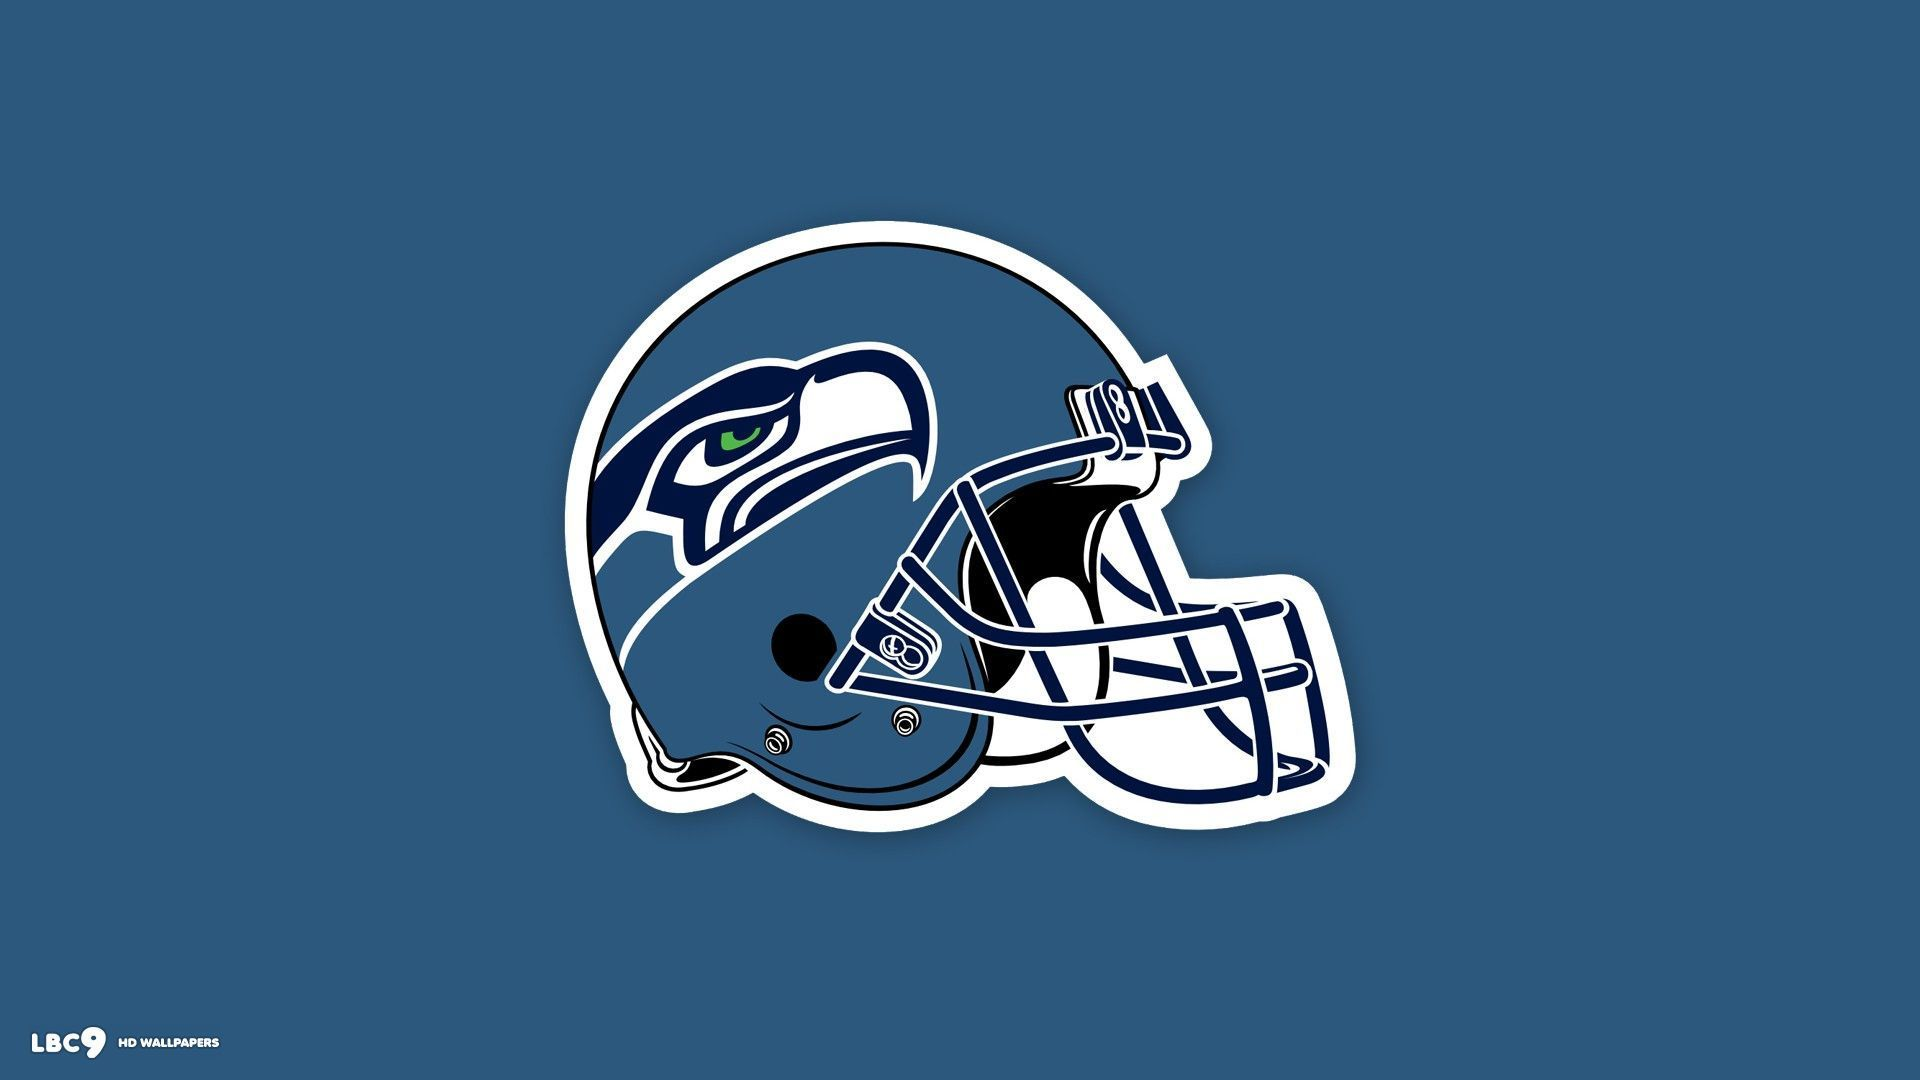 Seattle Seahawks Wallpapers Mywallpapers Site In 2020 Nfl Football Wallpaper Football Wallpaper Seattle Seahawks